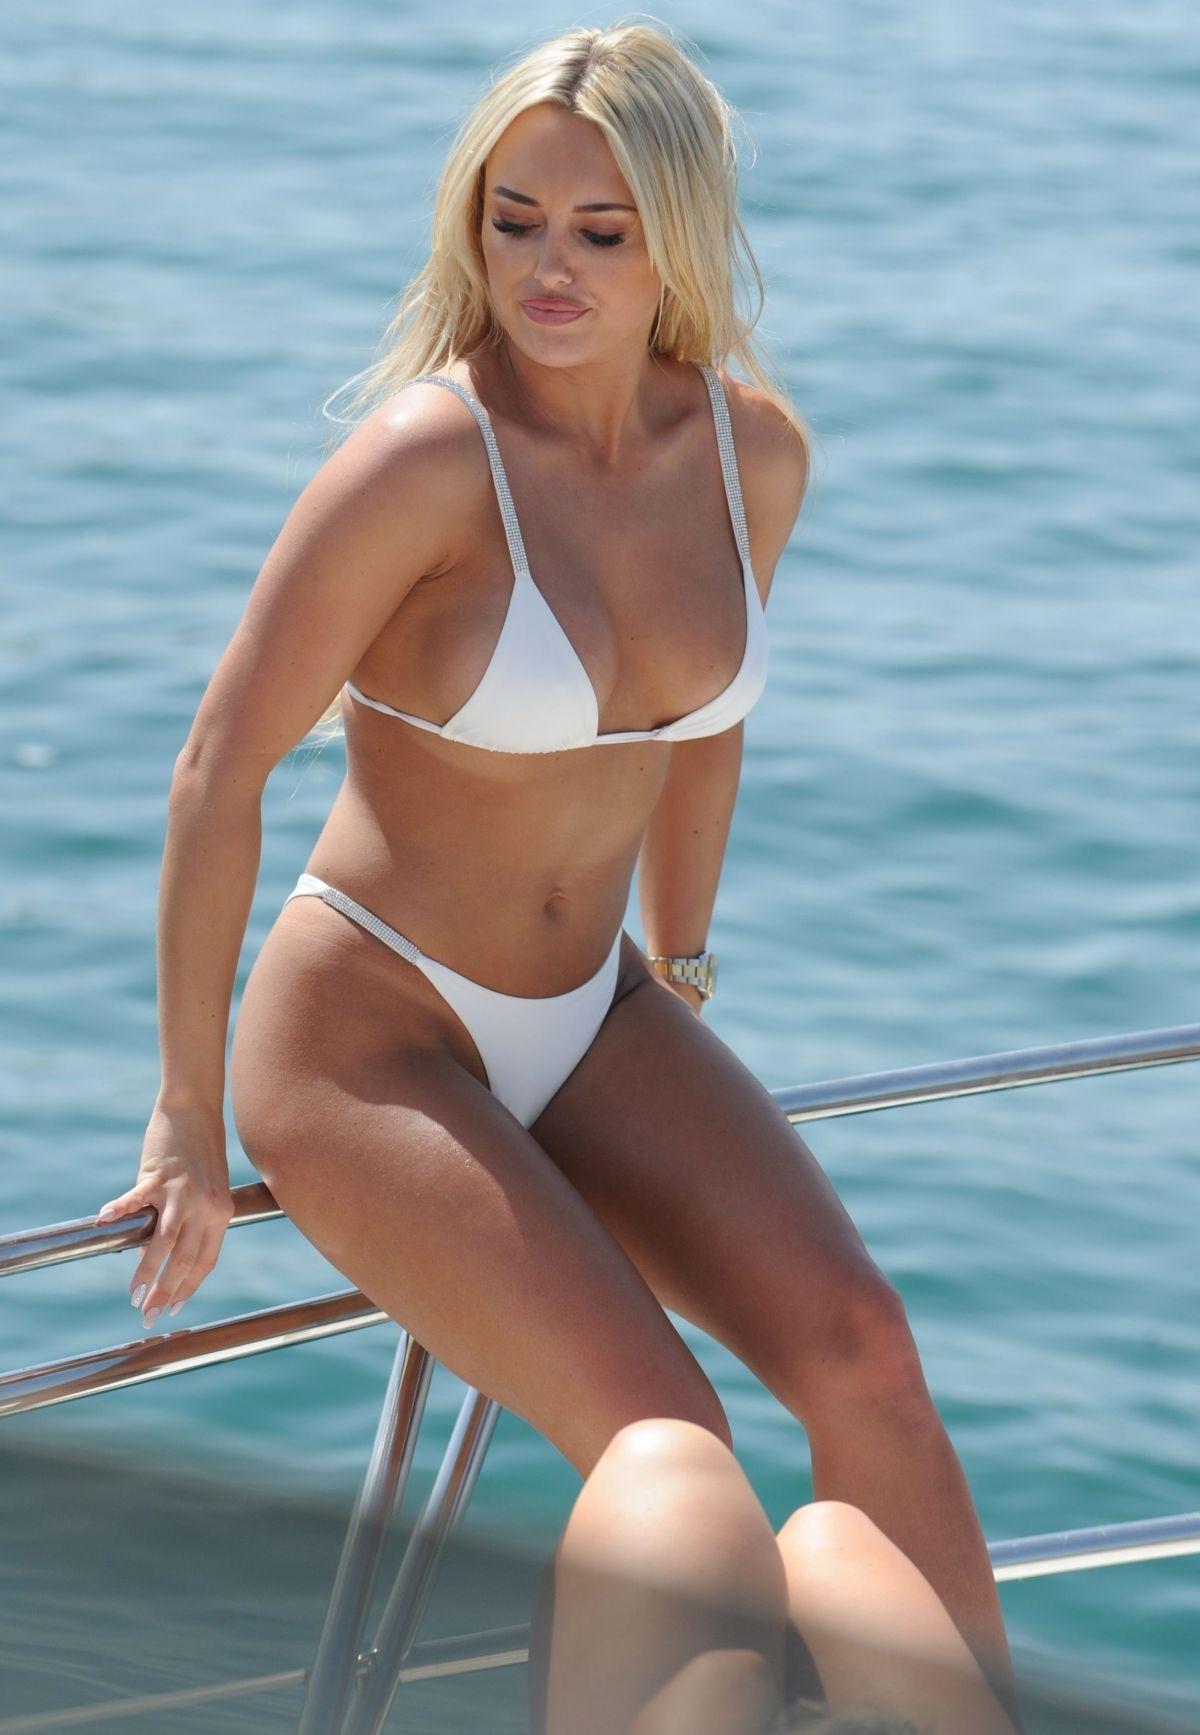 amber fox bikini